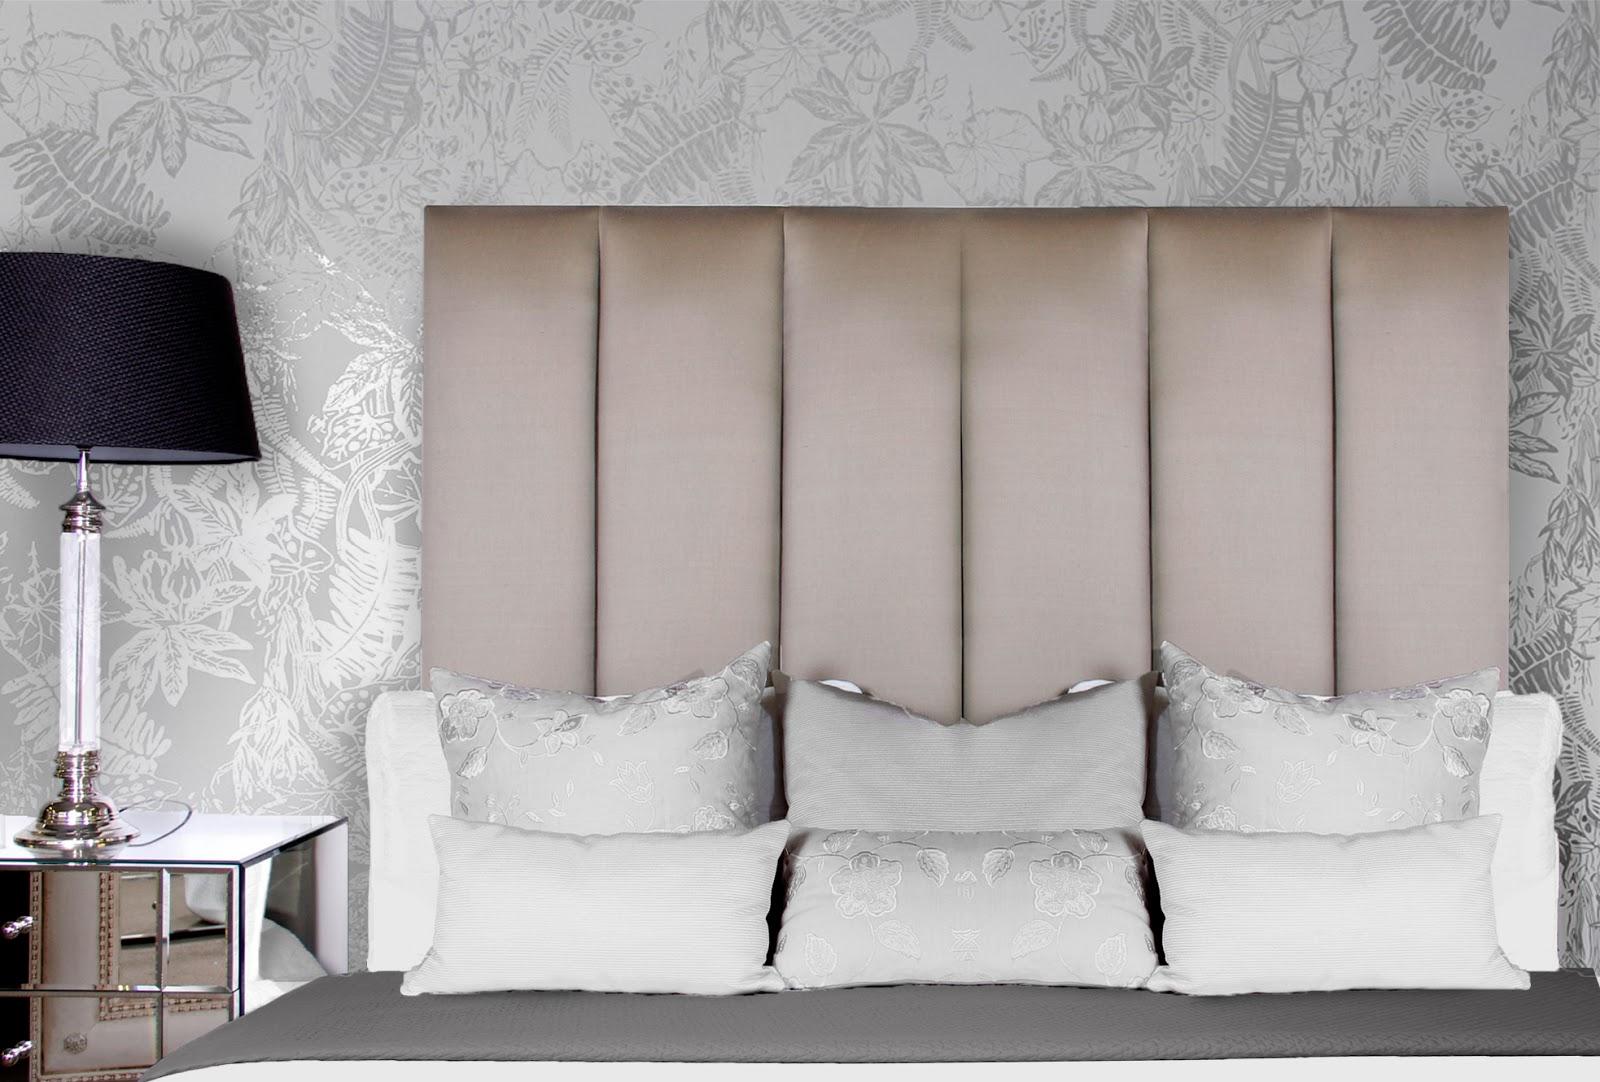 Bed head design wallpaper in your bedroom for Bed head design images